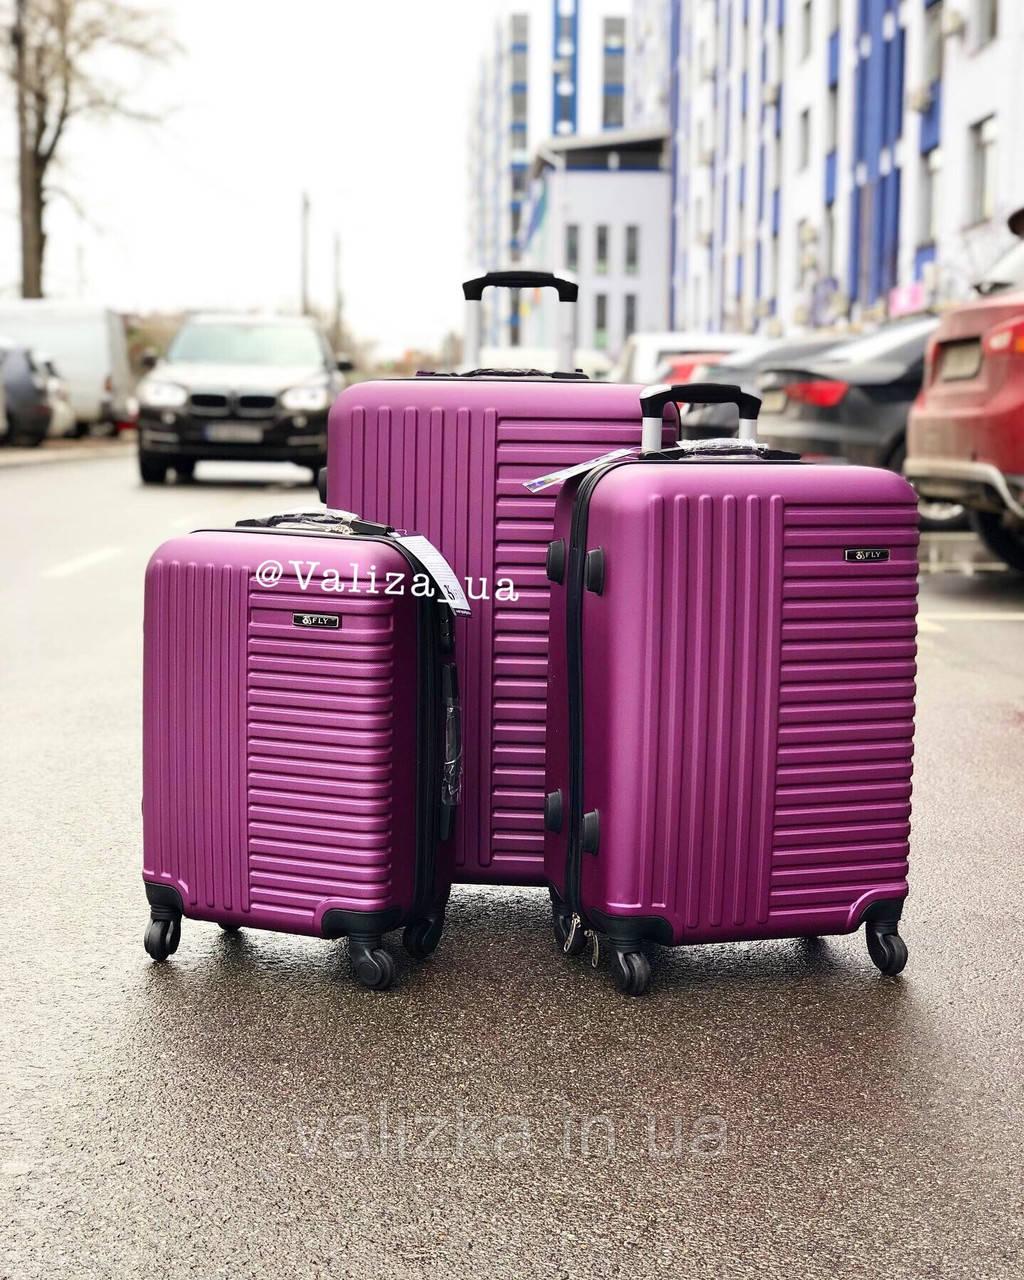 Пластиковый чемодан на 4-х колесах качественный фиолетовый чемодан / Пластикова валіза фіолетова